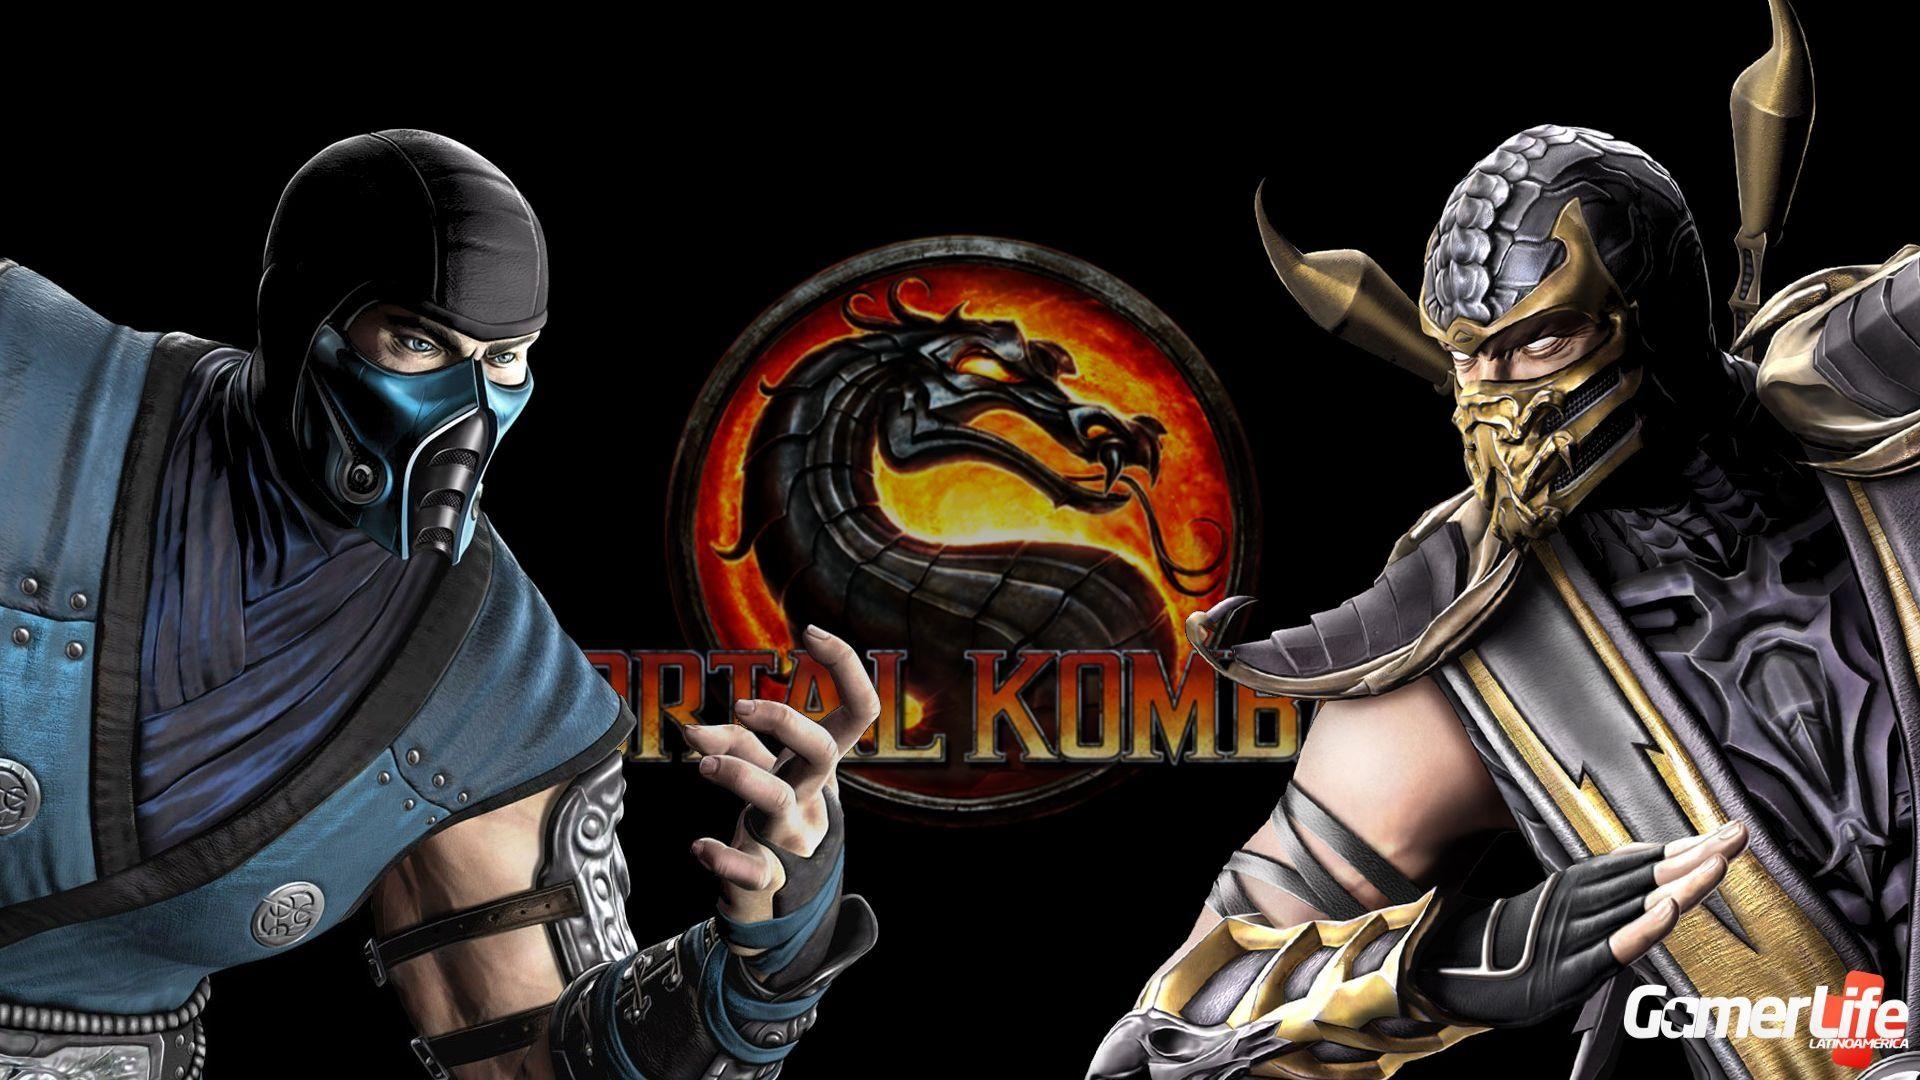 Mortal kombat ix dublado completo em httpswwwyoutubecomwatchv6syvzg47brgampt5195s - 5 6